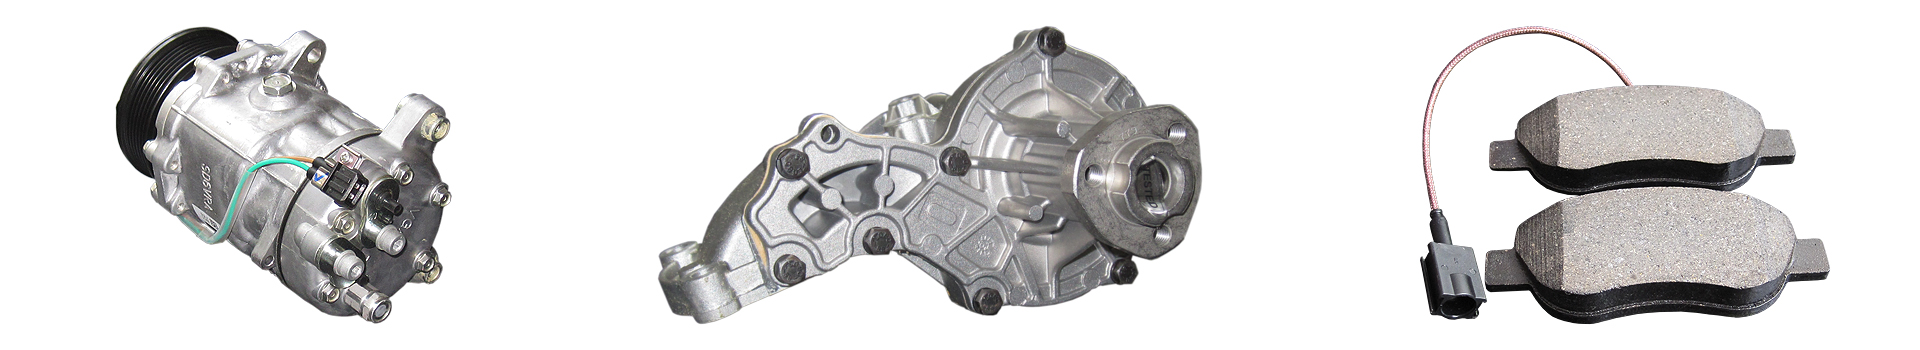 Kfz-Ersatzteile: Kompressor Wasserpumpe Bremsbelag